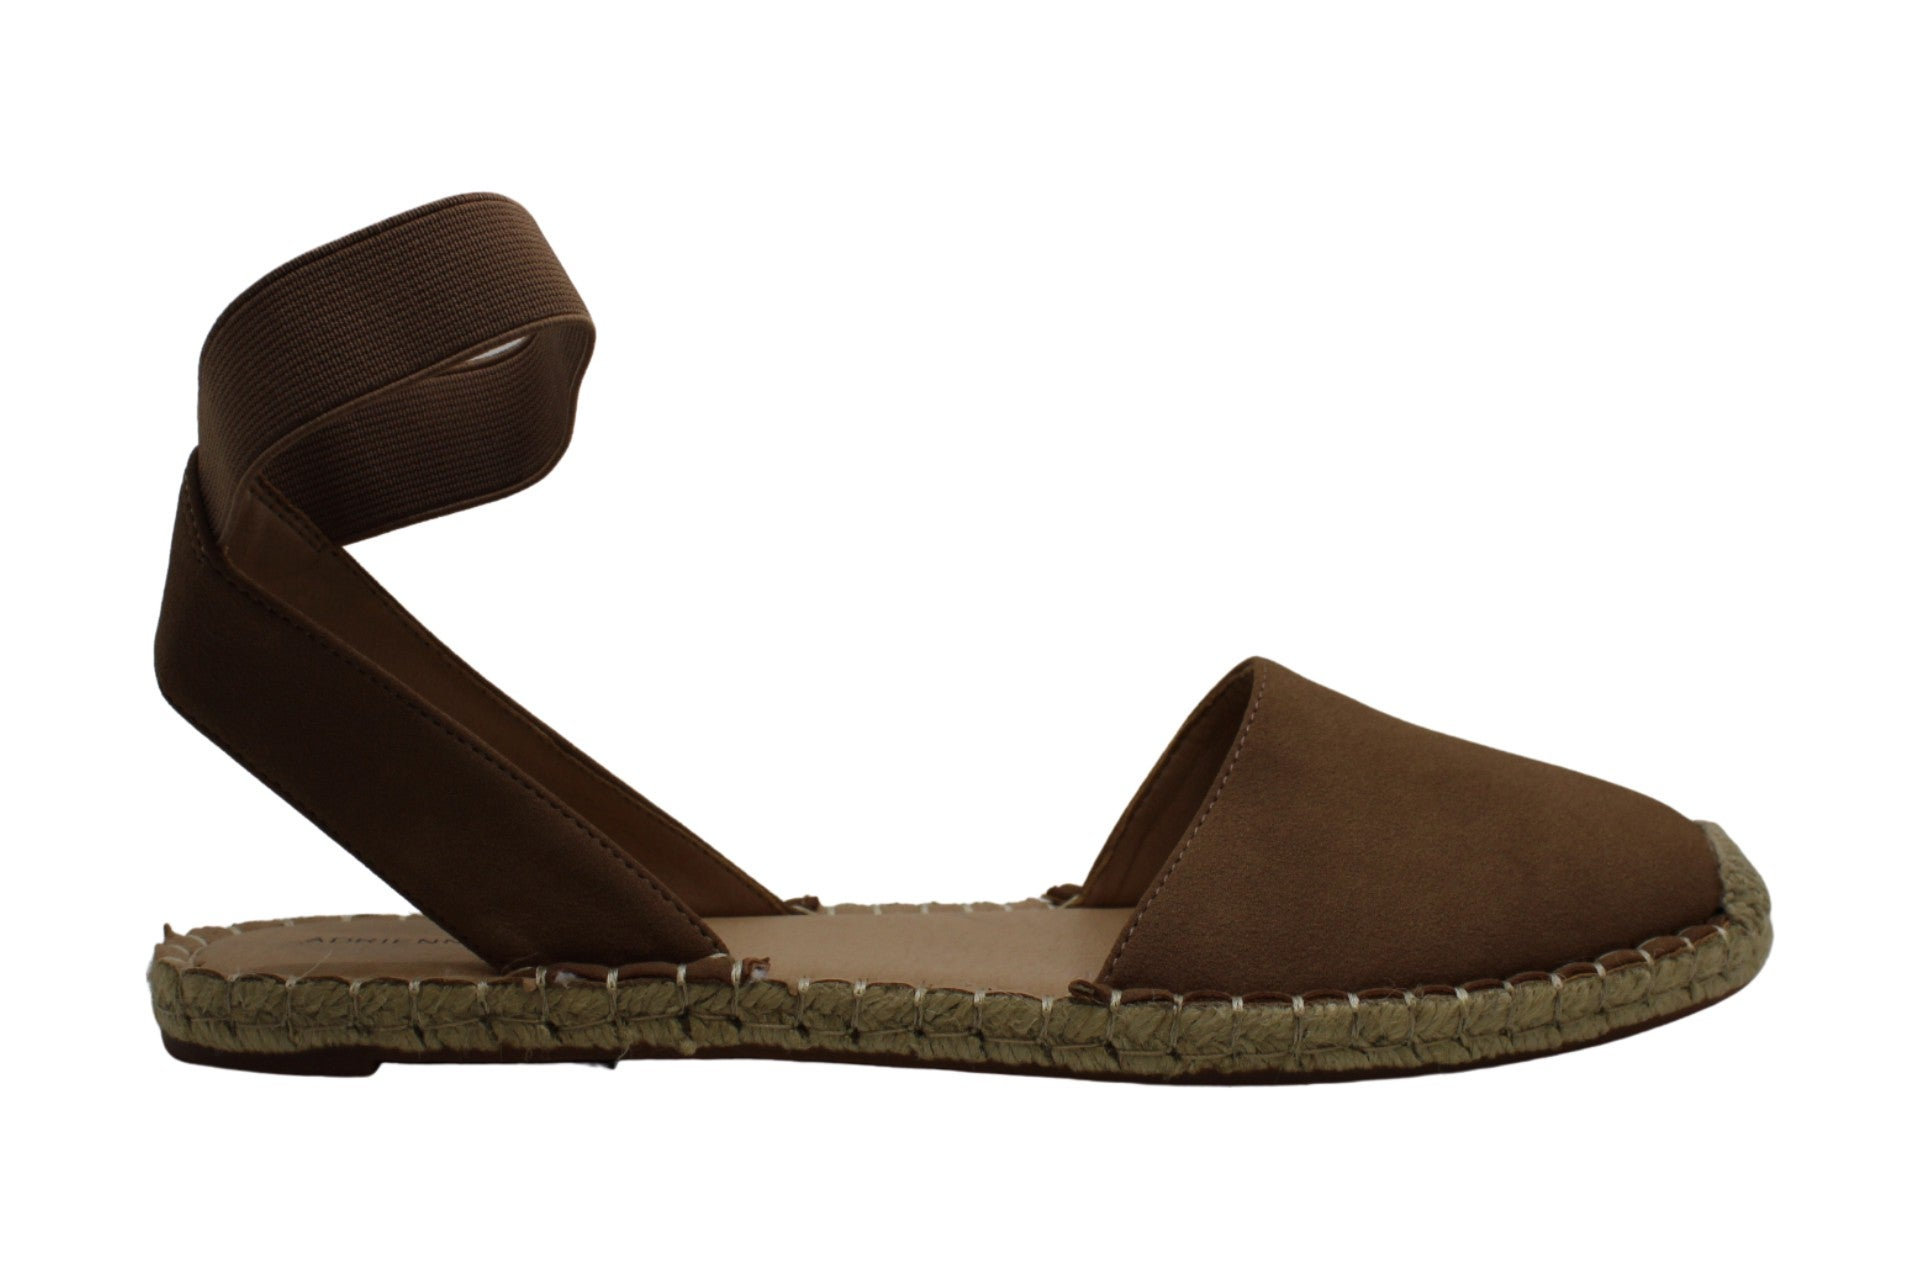 Adrienne Vittadini Women's Shoes Alvin NuBuck Closed Toe Casual Ankle Strap Sandals US